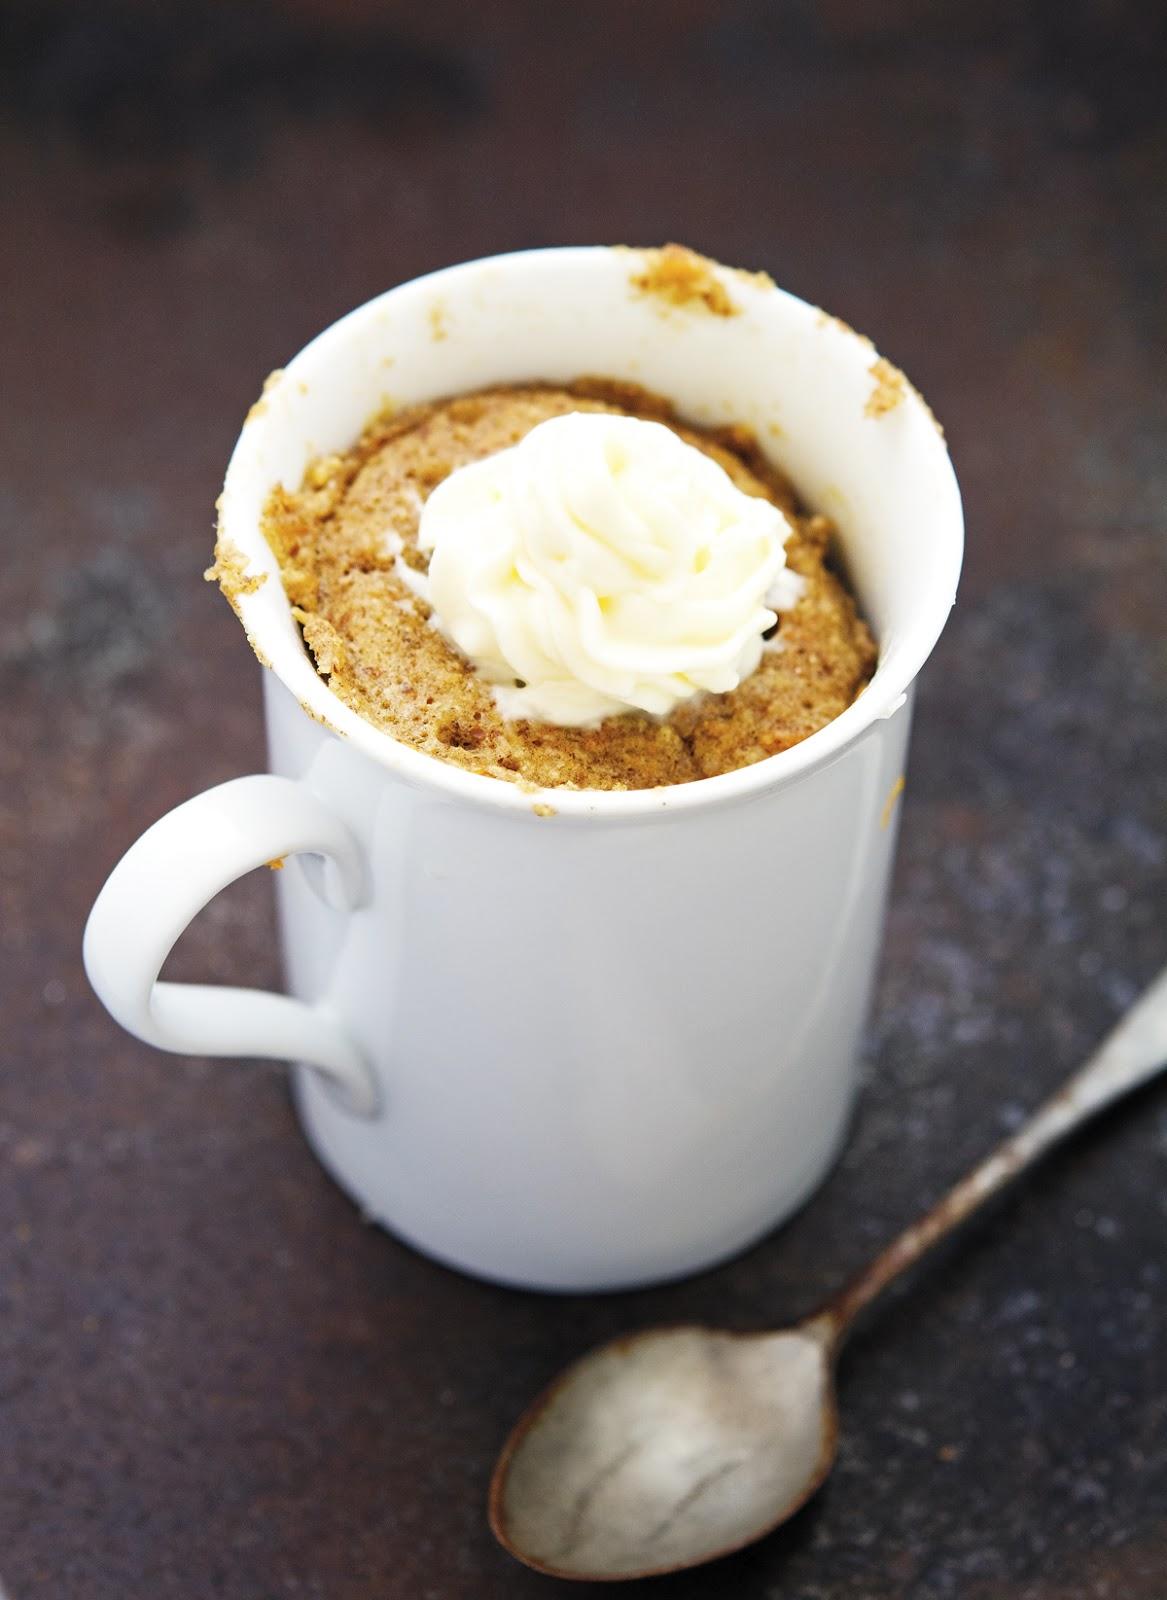 (Paleo) Carrot Cake In A Mug